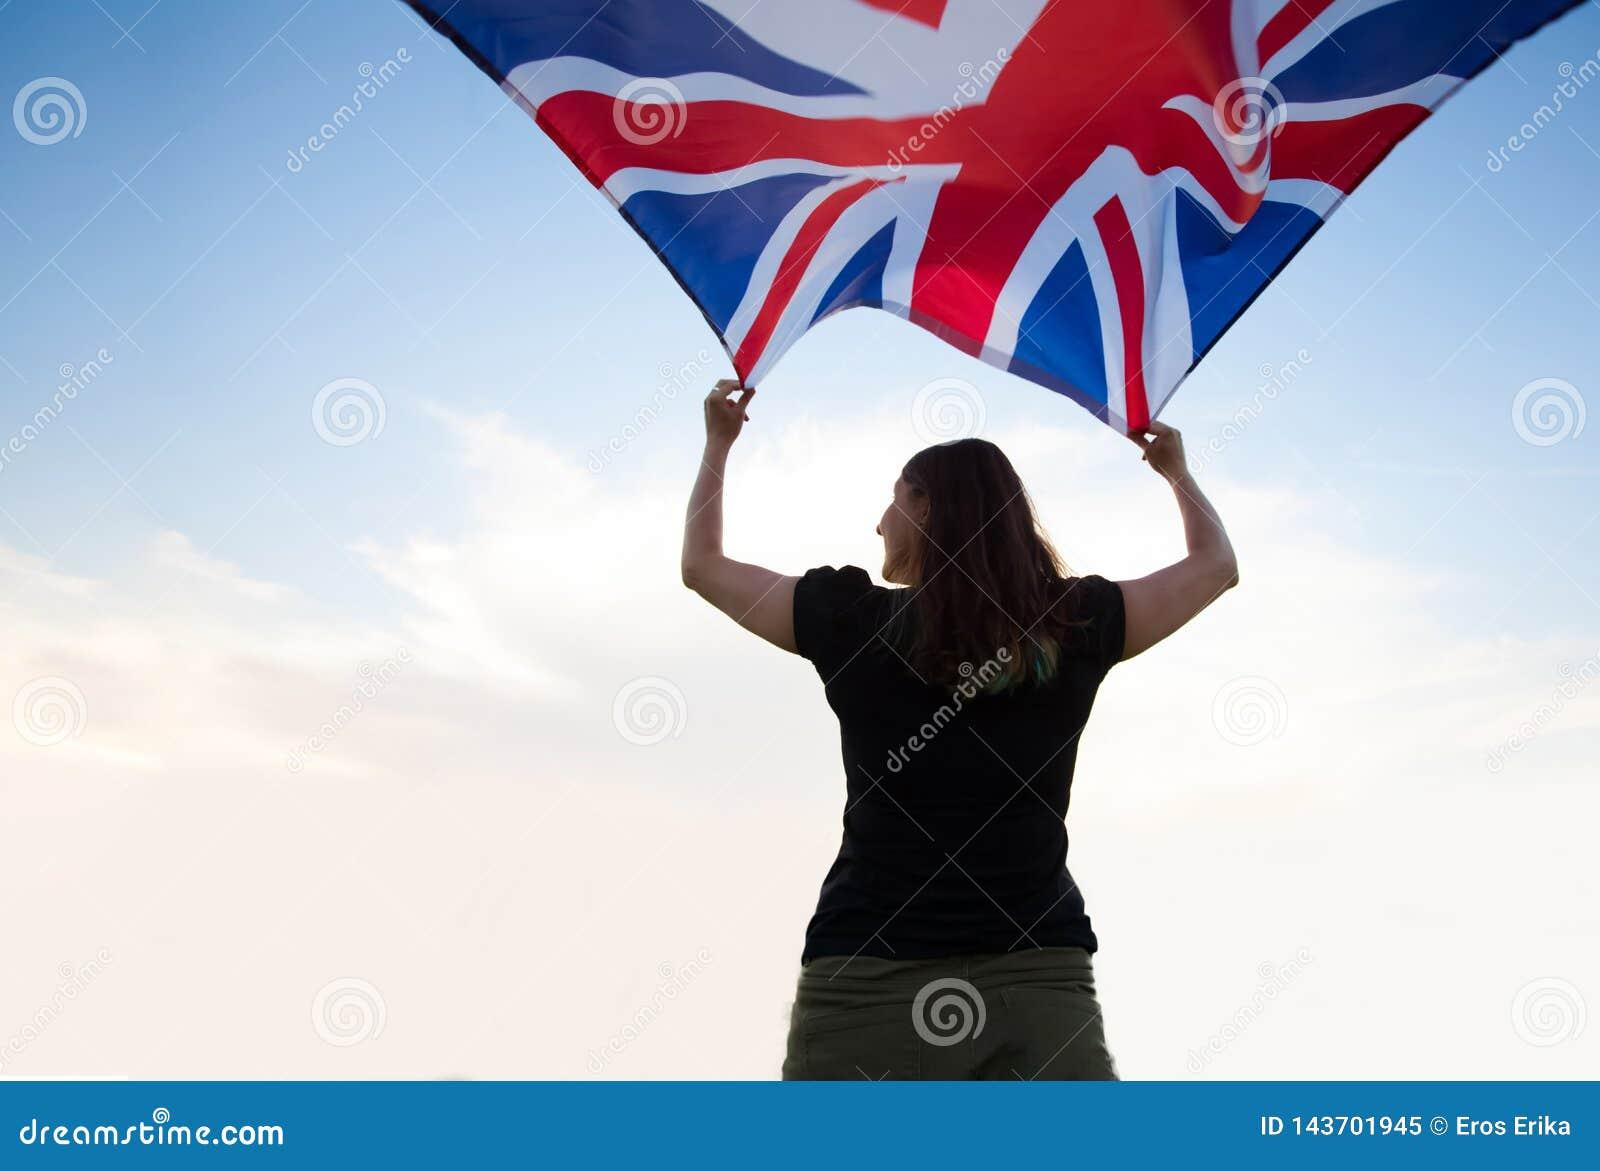 Frau in London mit einer Flagge